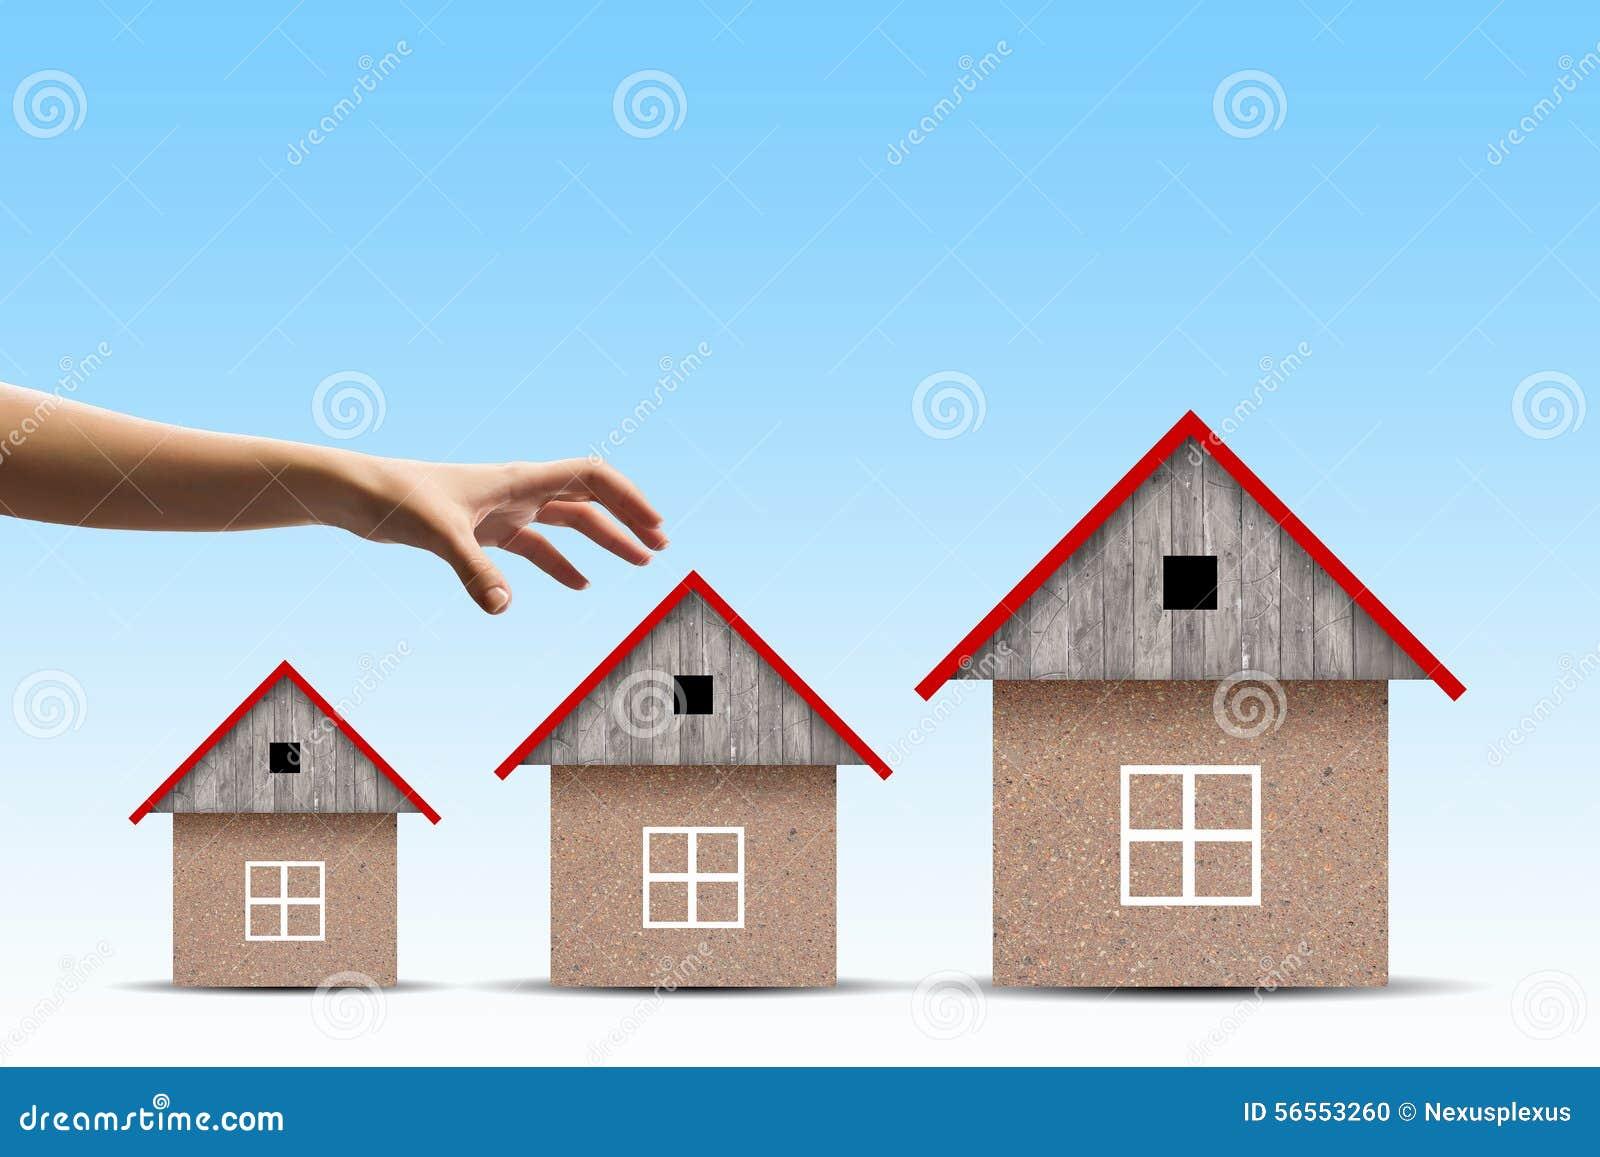 Download Μάζεμα με το χέρι του σπιτιού Στοκ Εικόνες - εικόνα από χρώμα, σχέδιο: 56553260